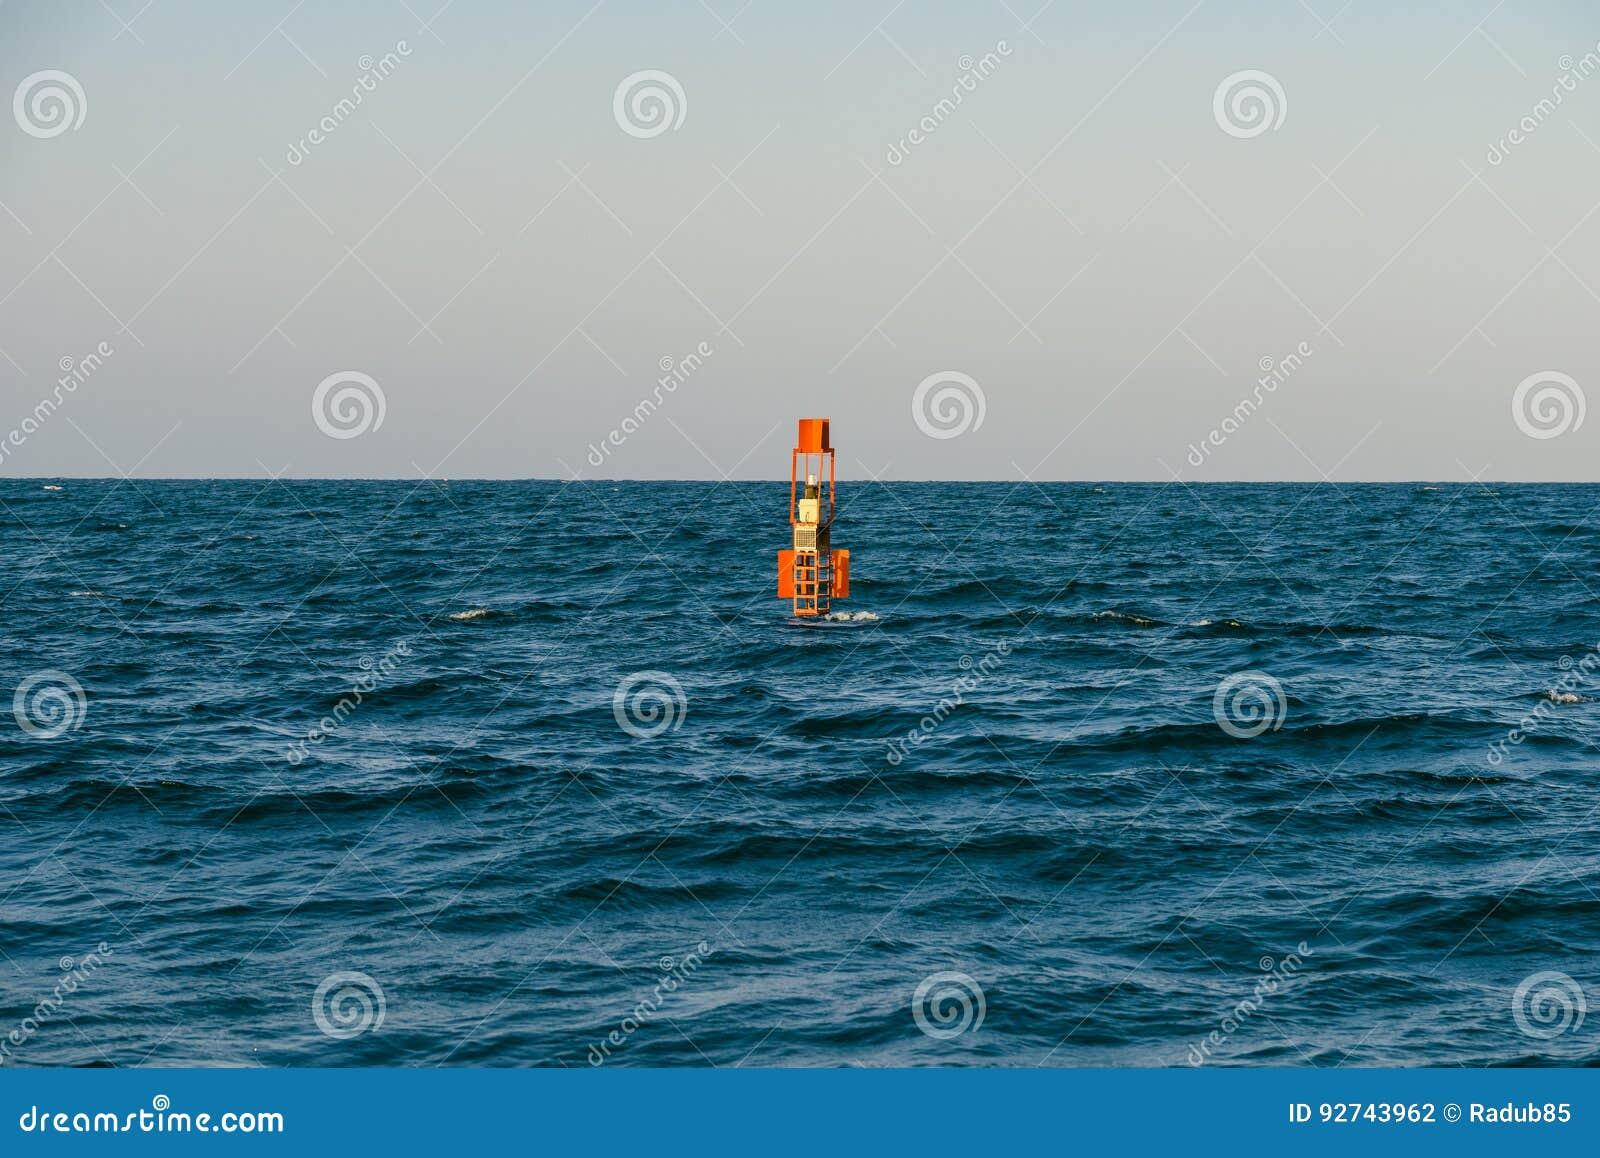 Red Warning Light Floating In Ocean Stock Photo